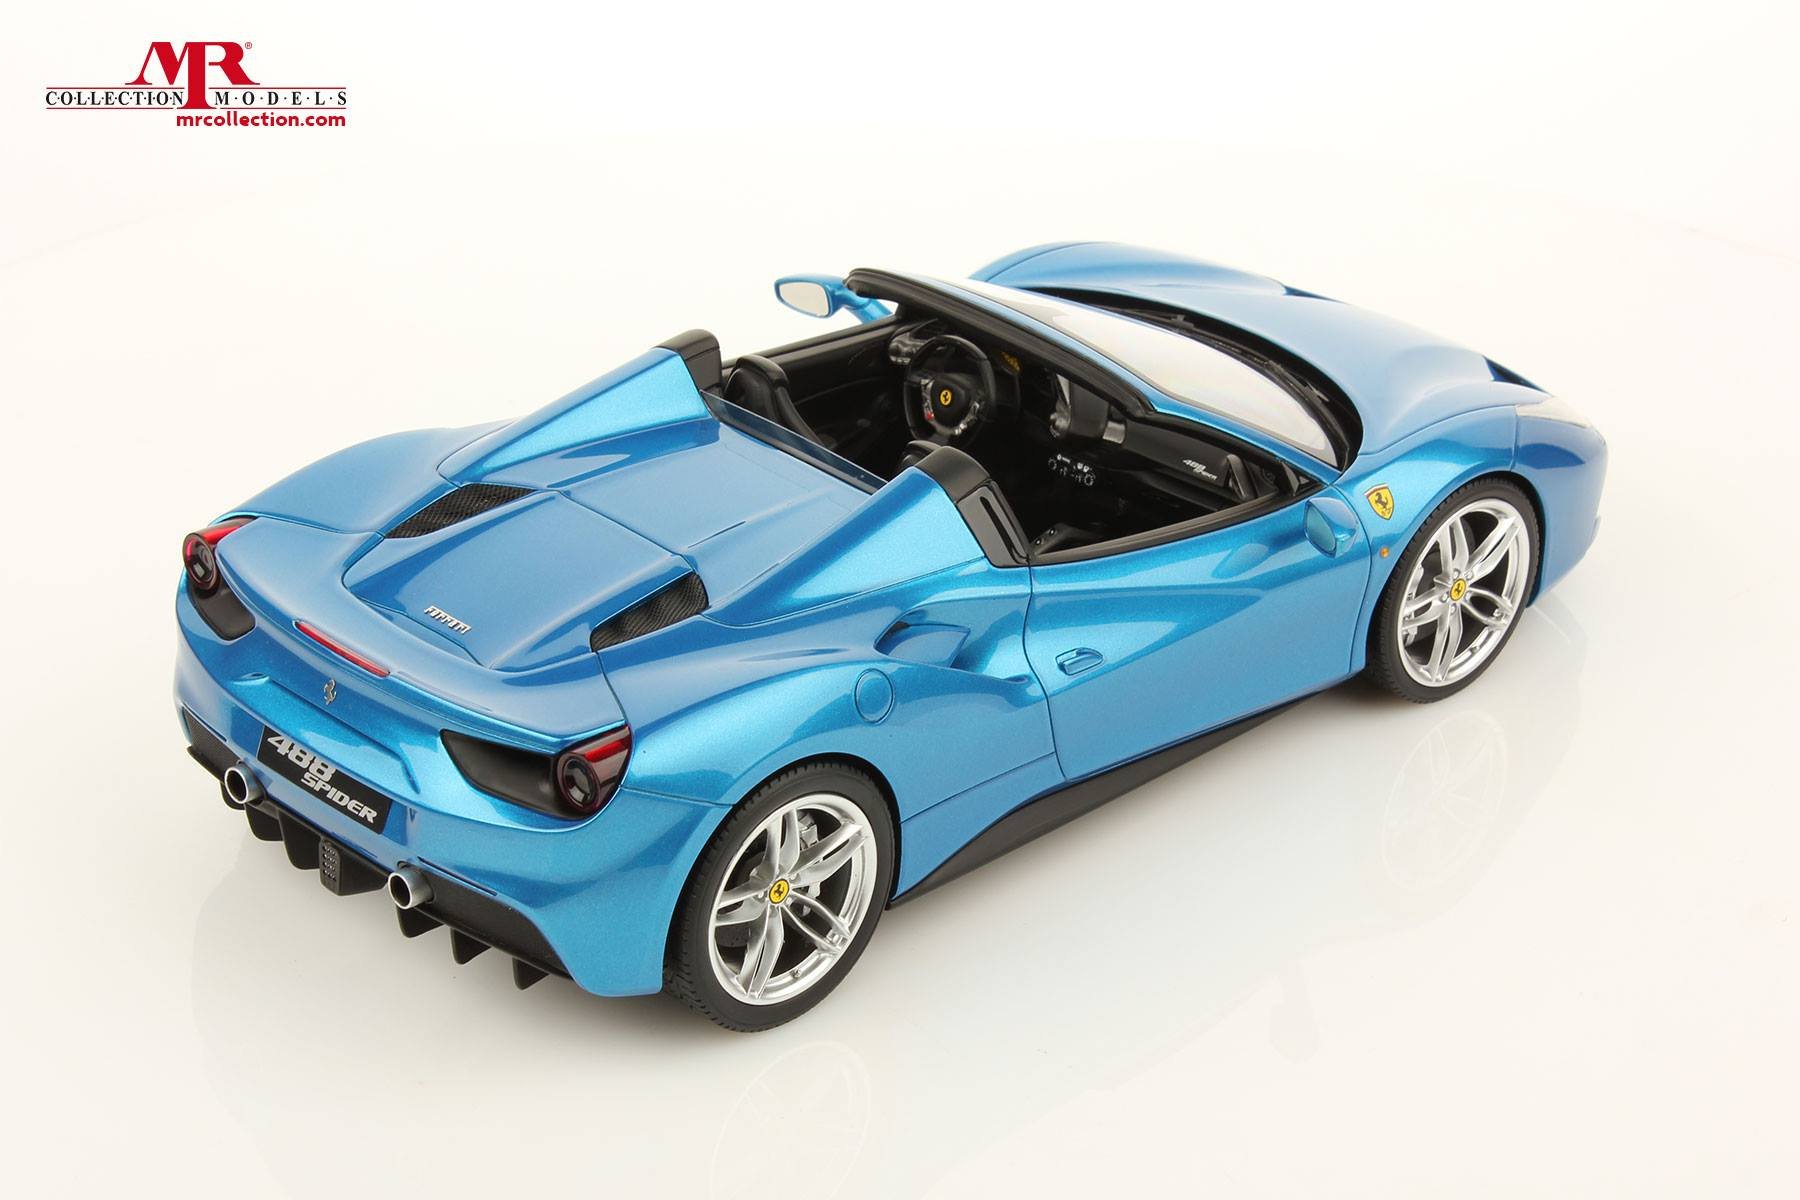 ferrari-488-spider-1-18-scale-model-comes-with-the-appropriate-color-video-photo-gallery_2 Cool Lamborghini Countach Diecast 1 18 Cars Trend